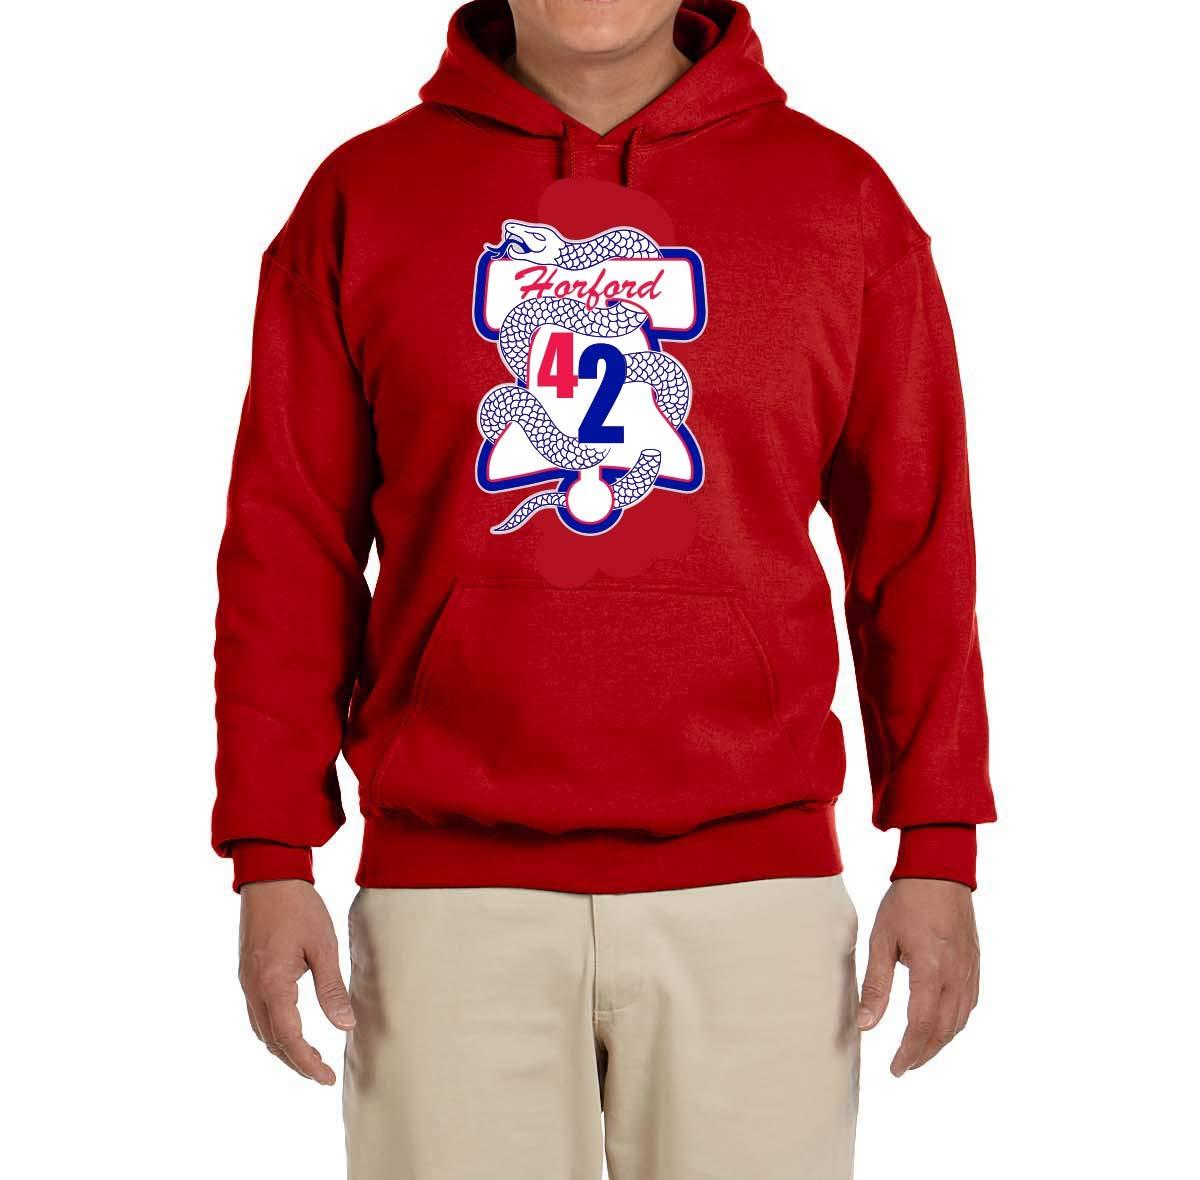 Tobin Clothing Blue Philadelphia Horford Logo Hooded Shirts